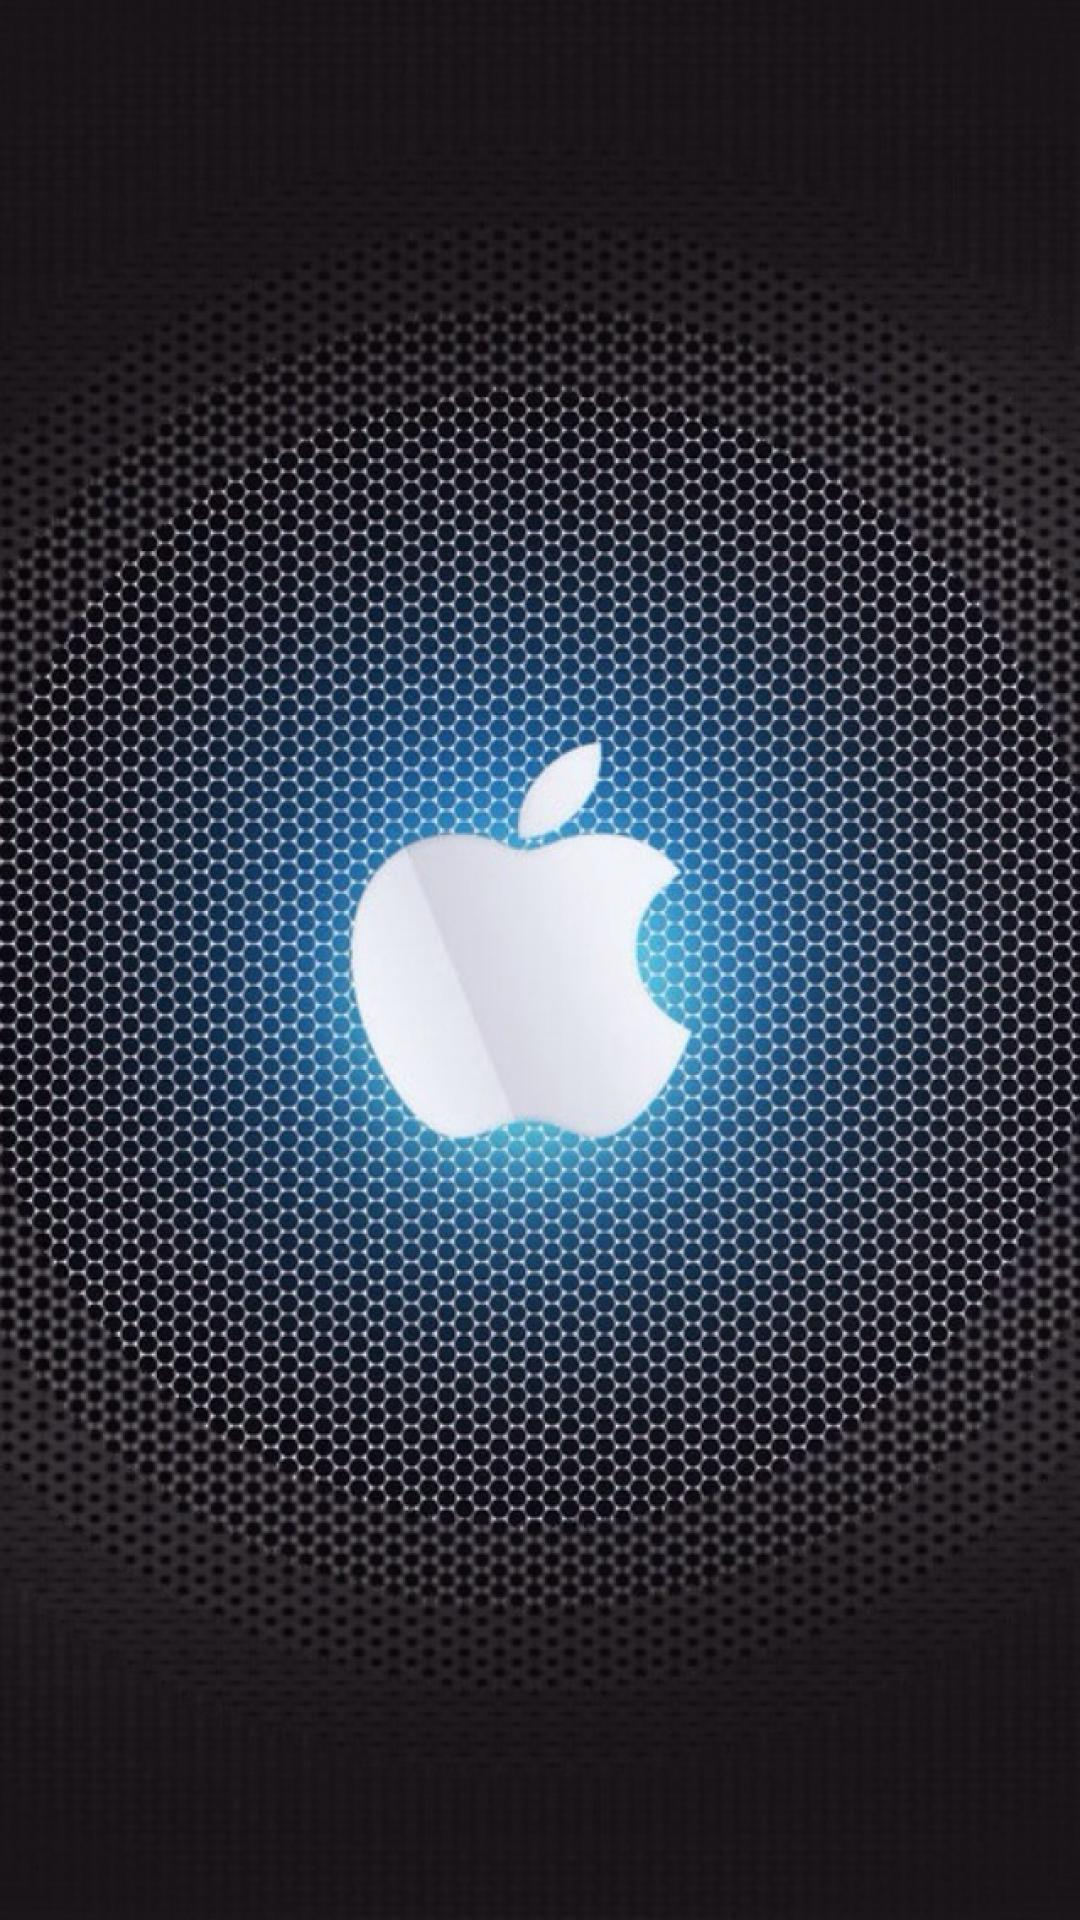 Apple Iphone Wallpaper HD 1080x1920 2 - live wallpaper HD Desktop